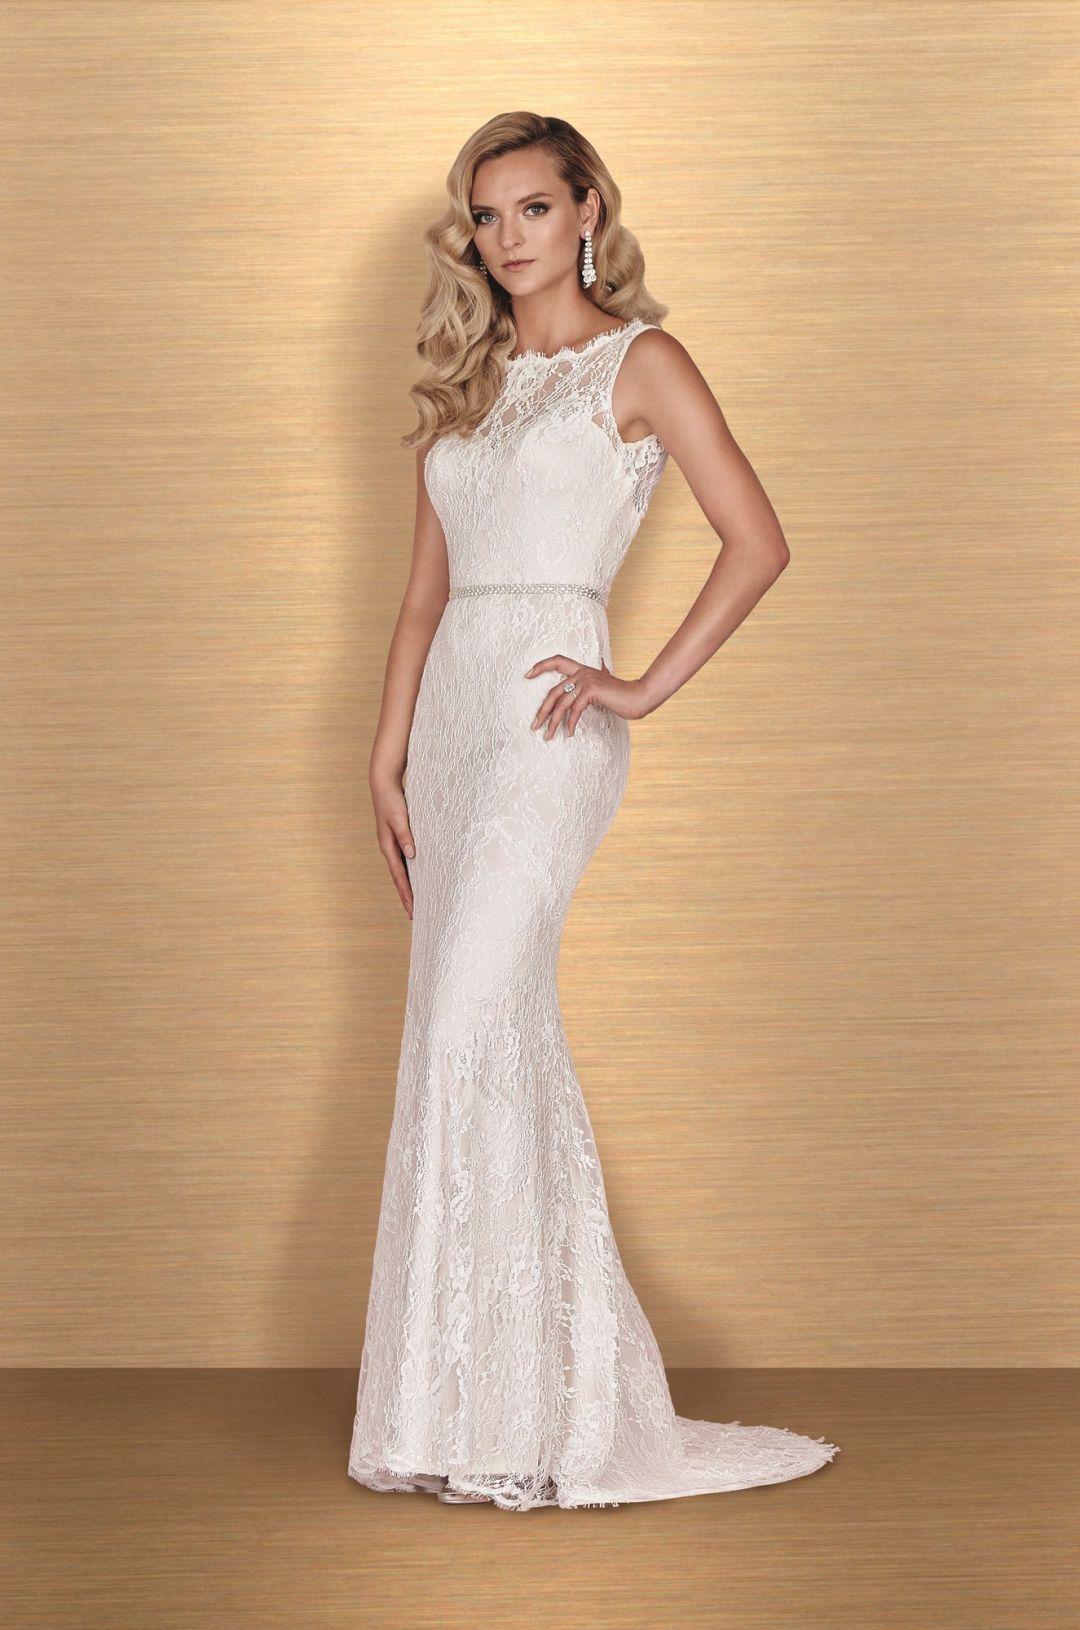 Bateau neckline wedding dress style paloma blanca gowns at